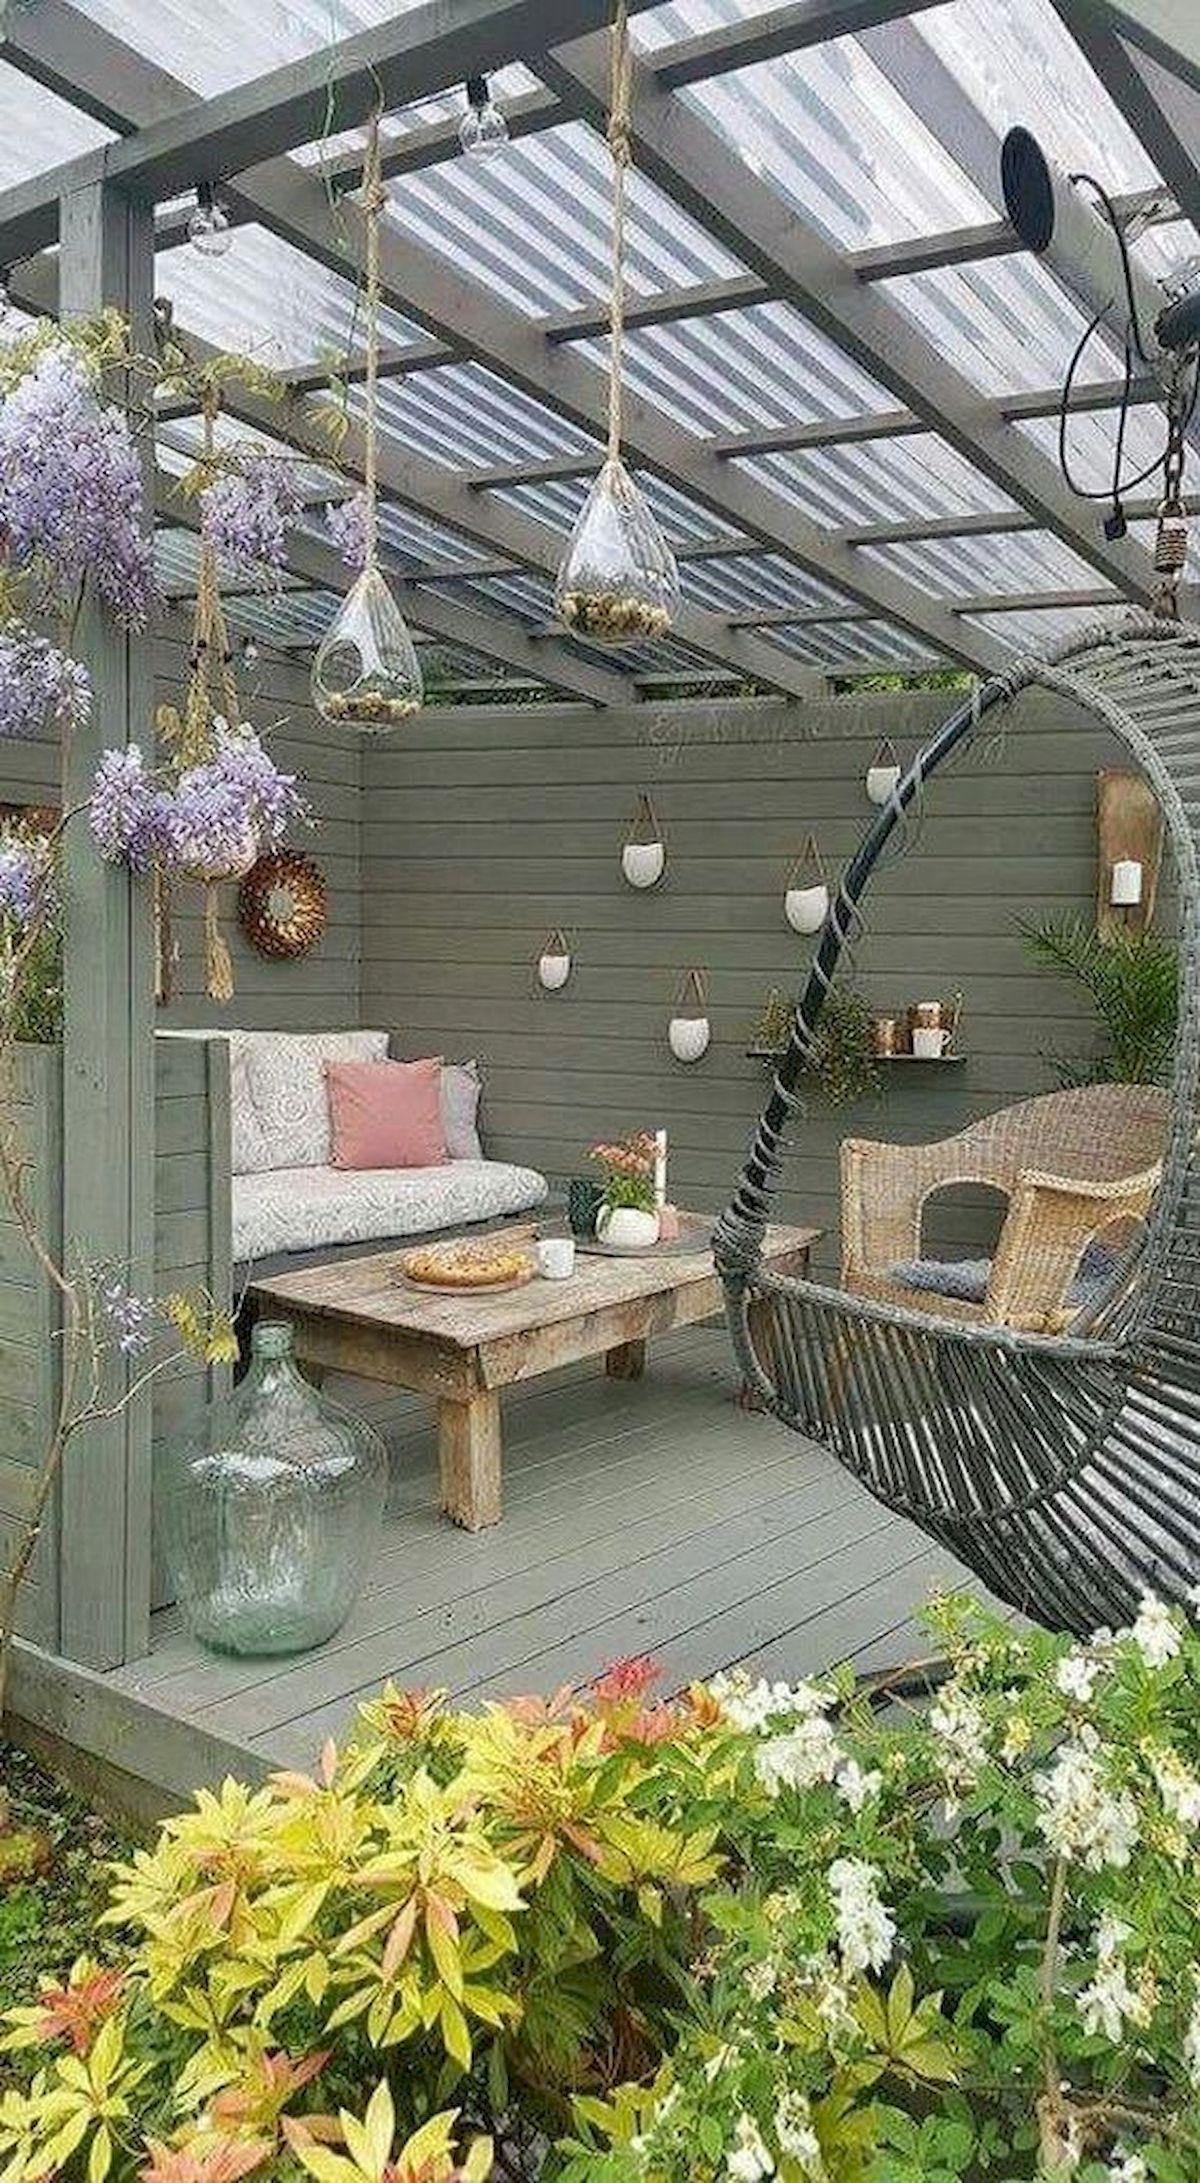 50 Best DIY Backyard Patio And Decking Design Ideas (33)